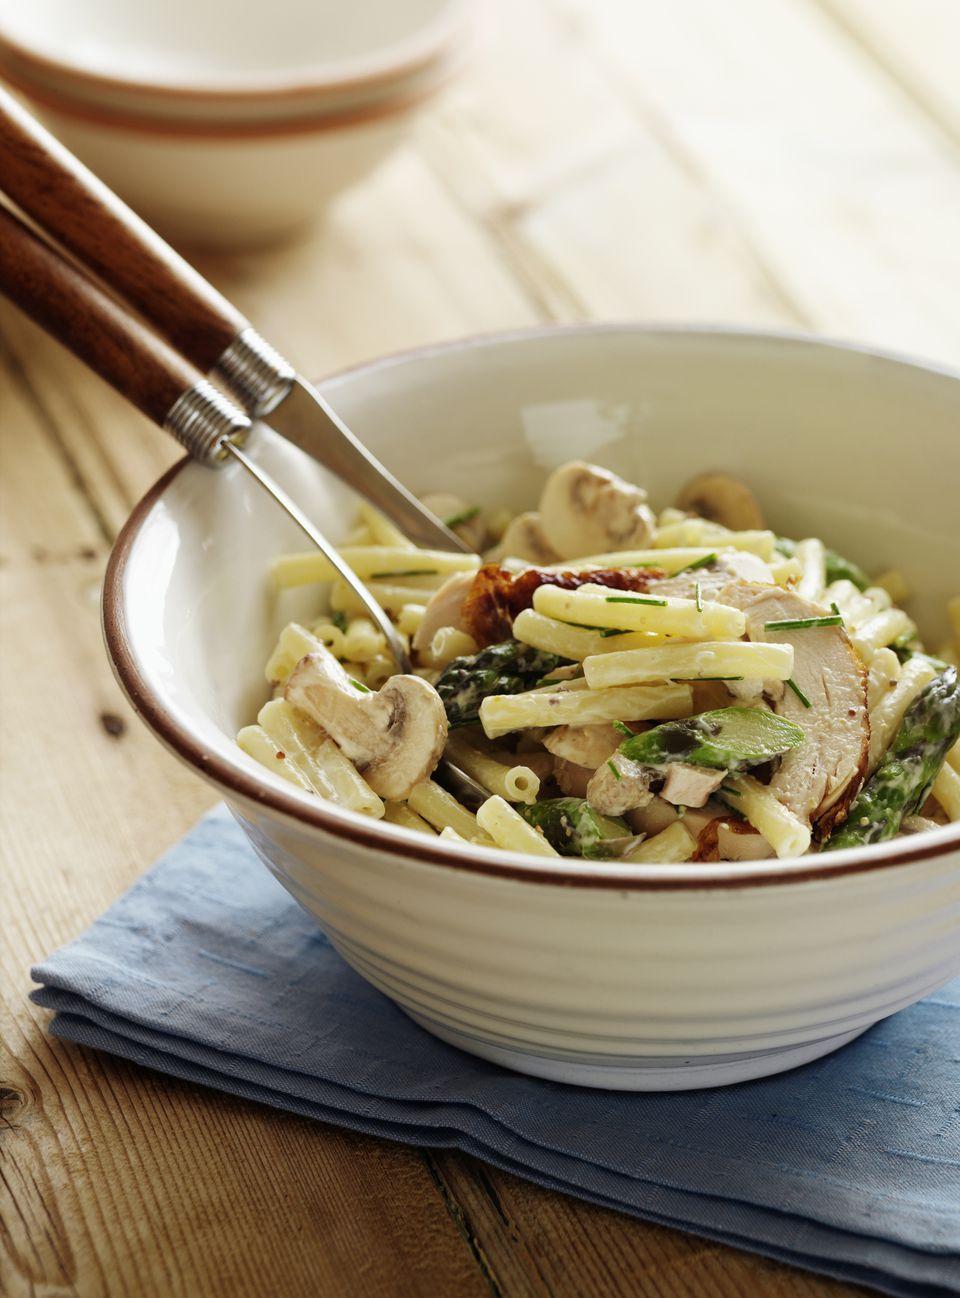 Creamy chicken pasta and asparagus